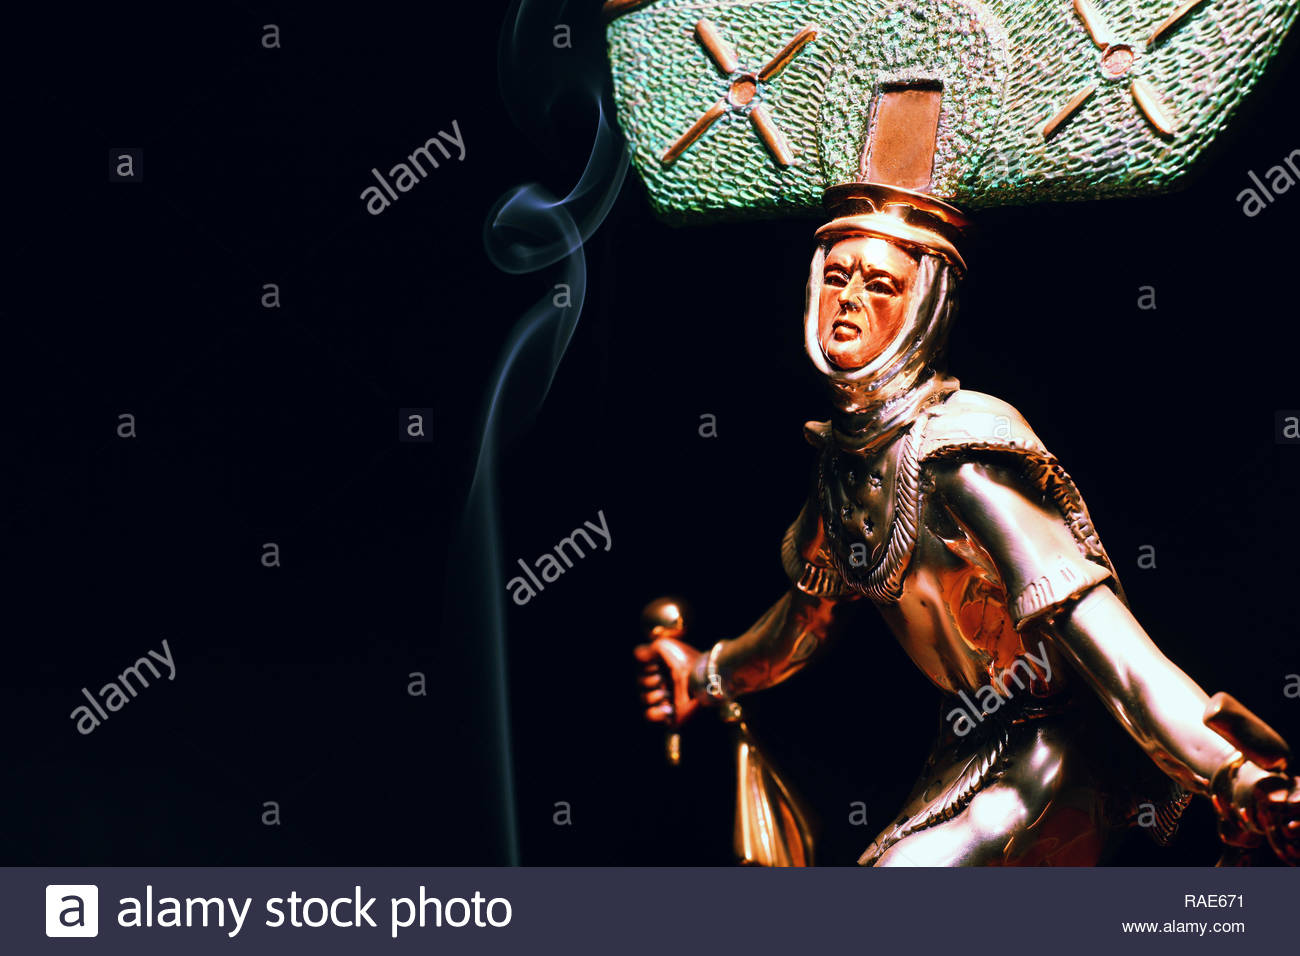 shaman figure smoke dark background - Stock Image